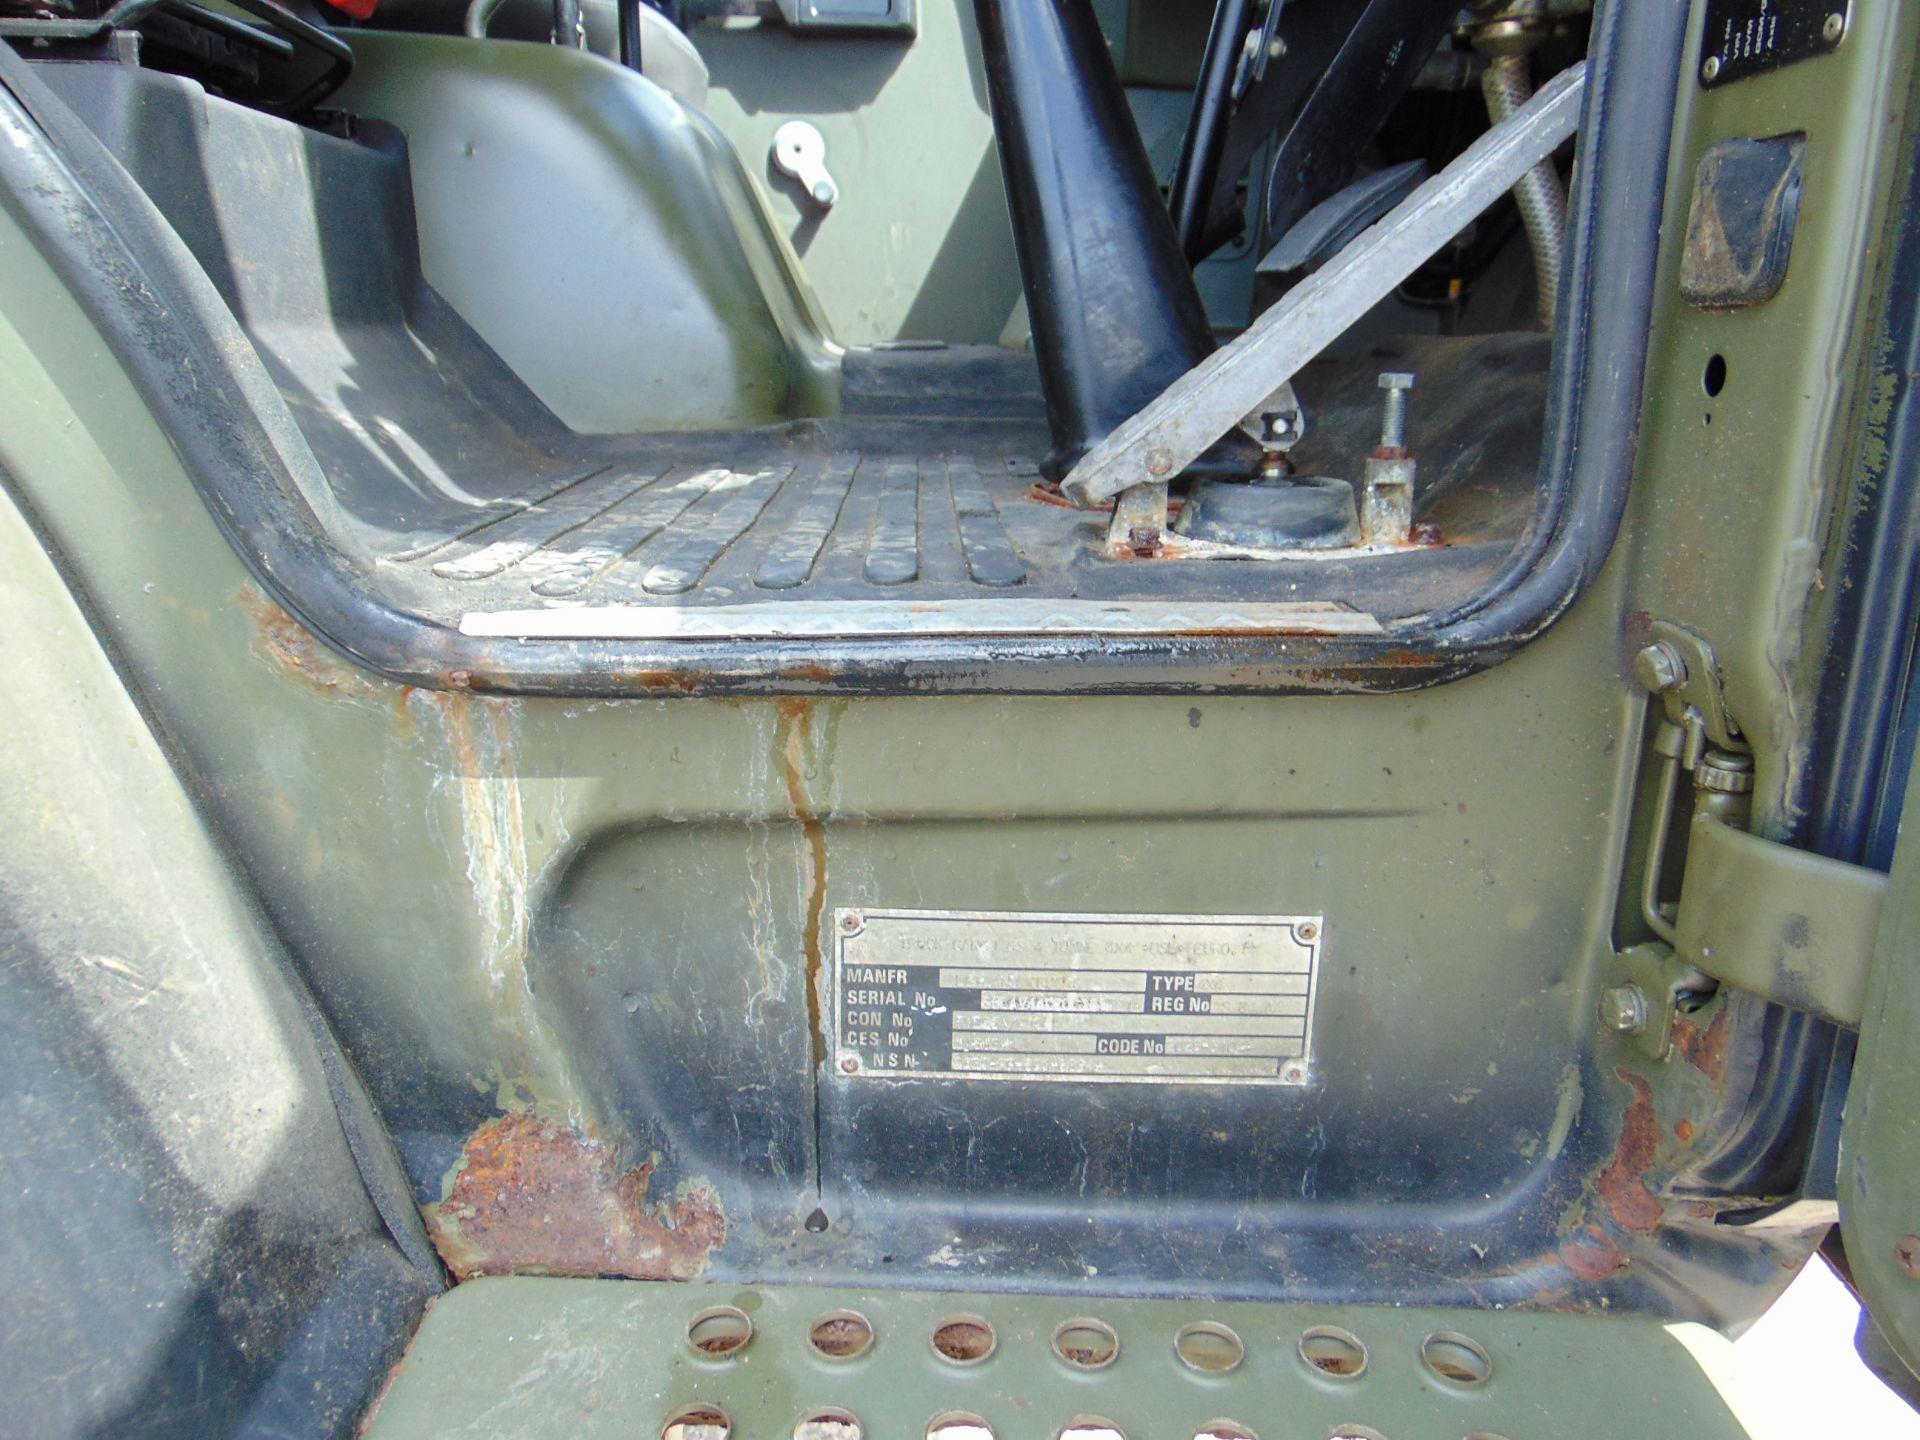 Leyland Daf 45/150 4 x 4 - Image 10 of 22